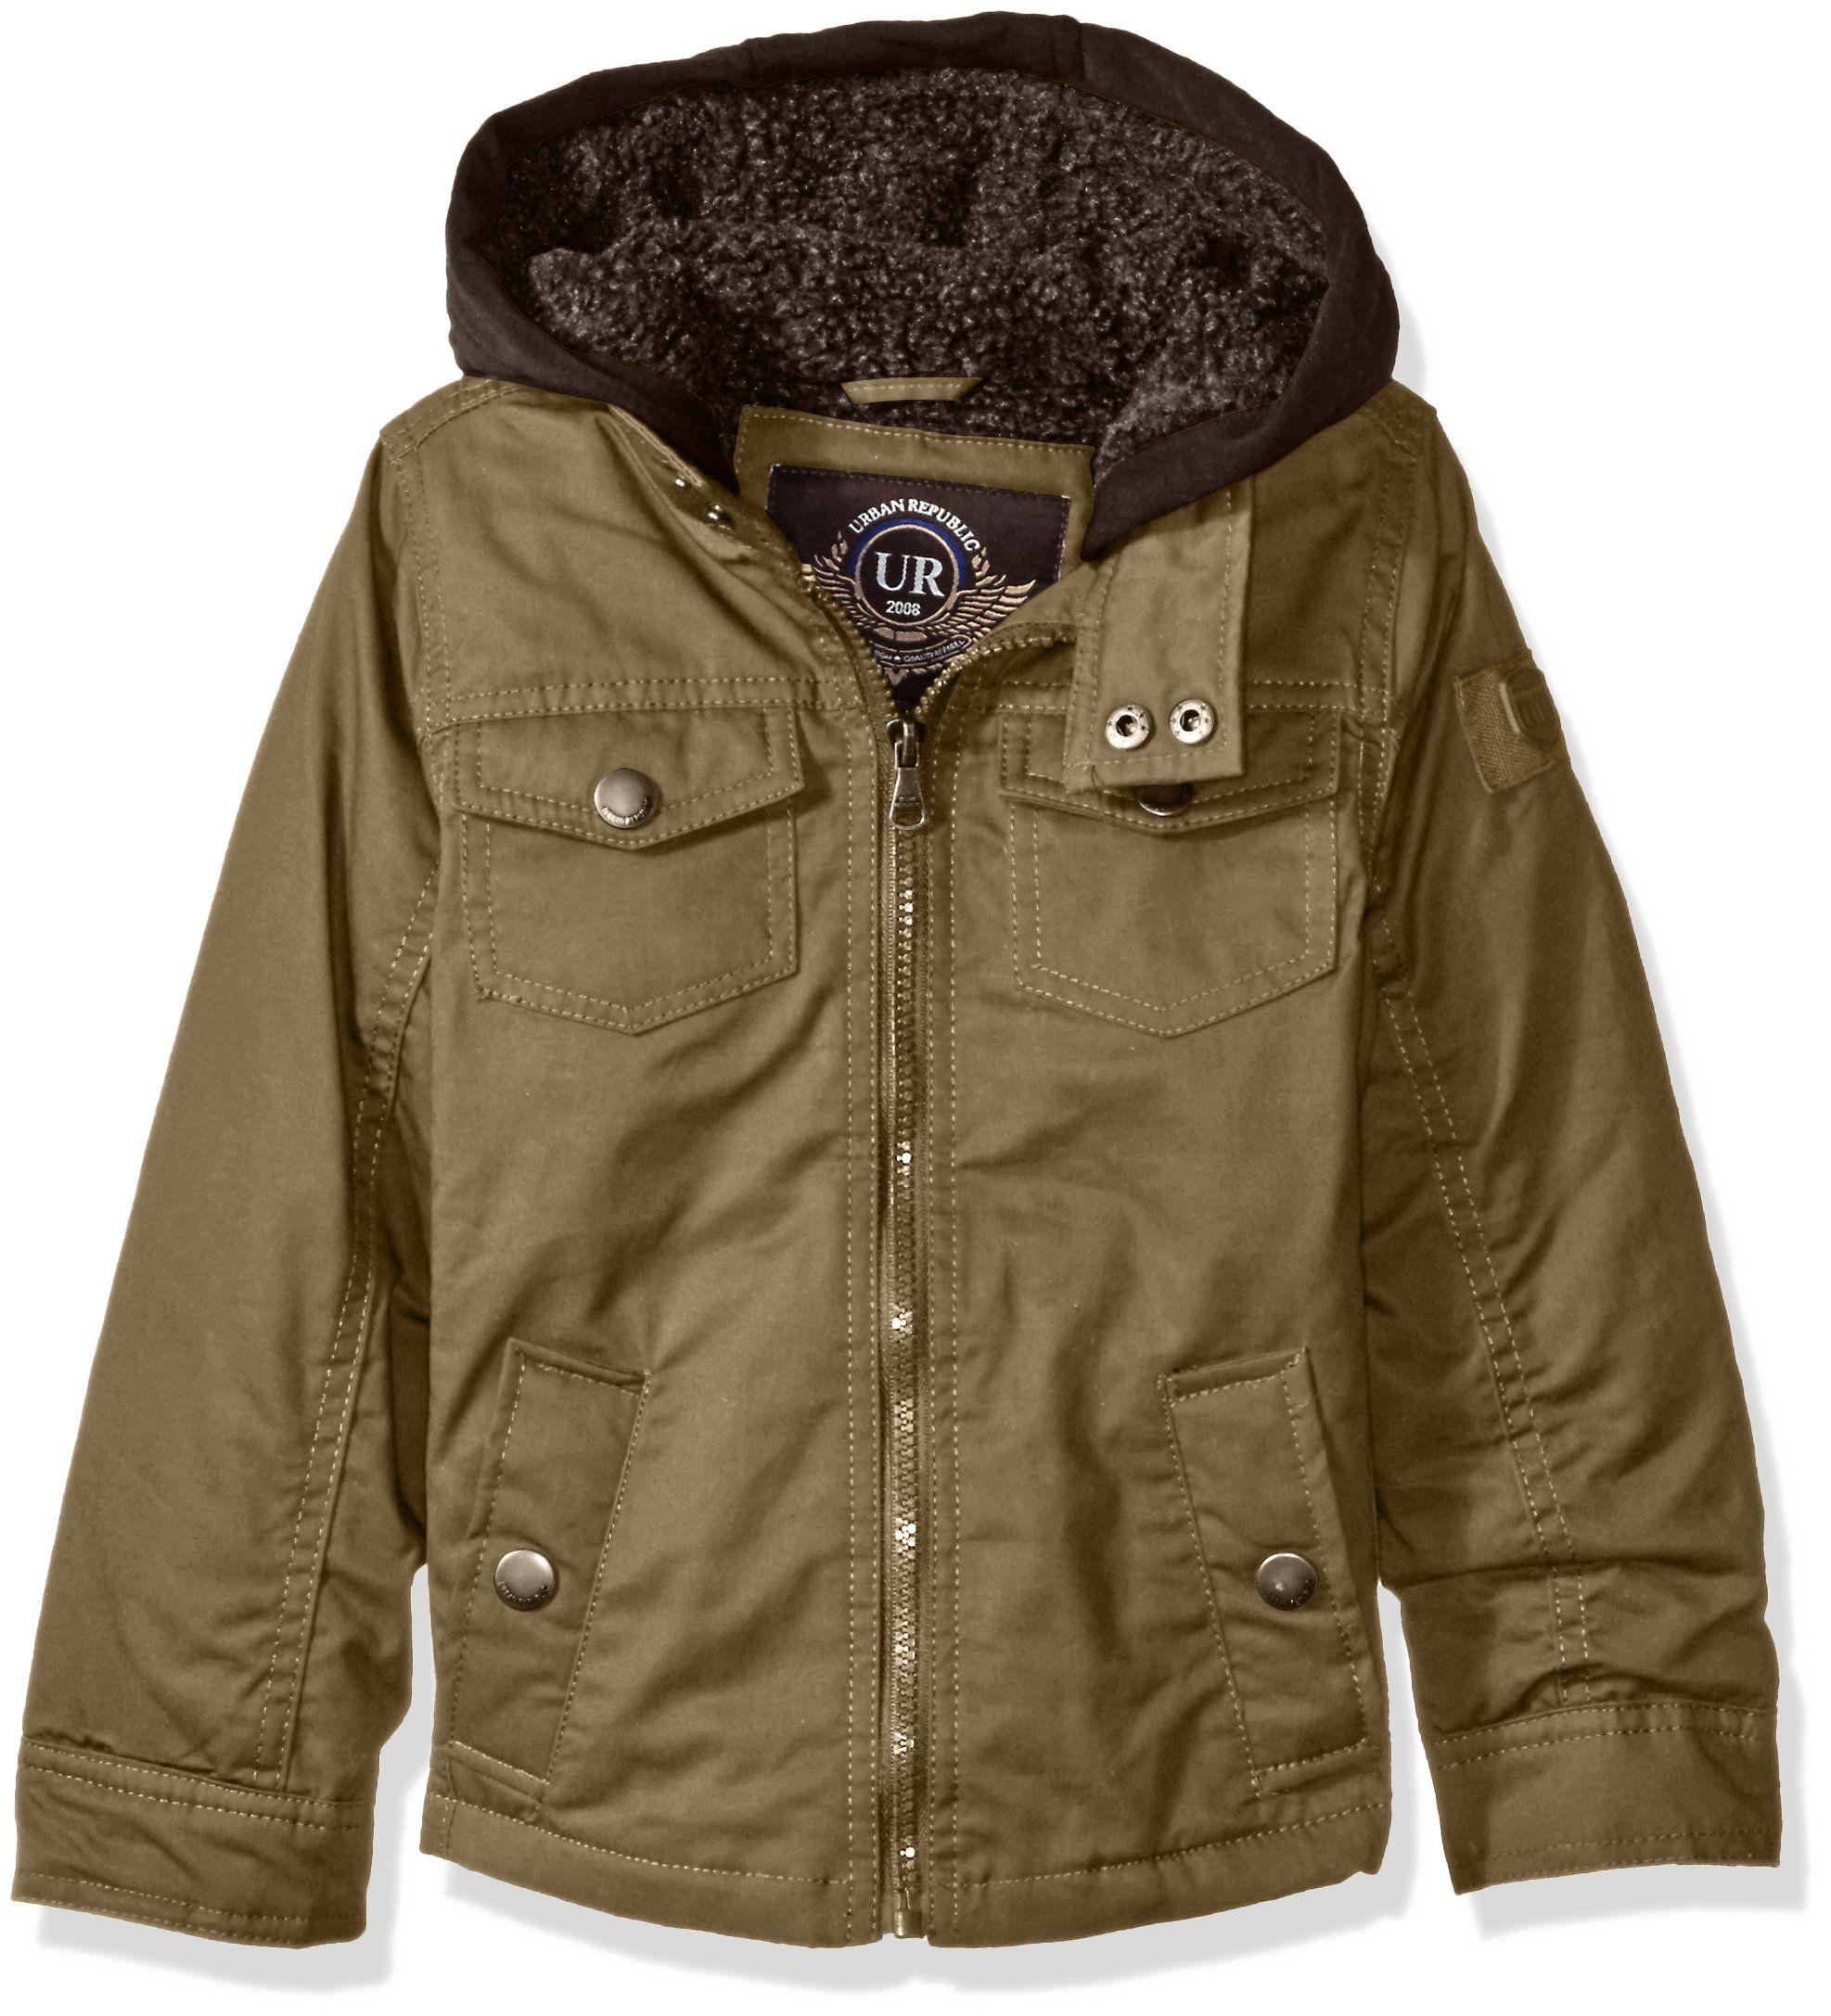 3c52db4bb185 Urban Republic Little Boys  Washed Cotton Twill Jacket with Fleece ...